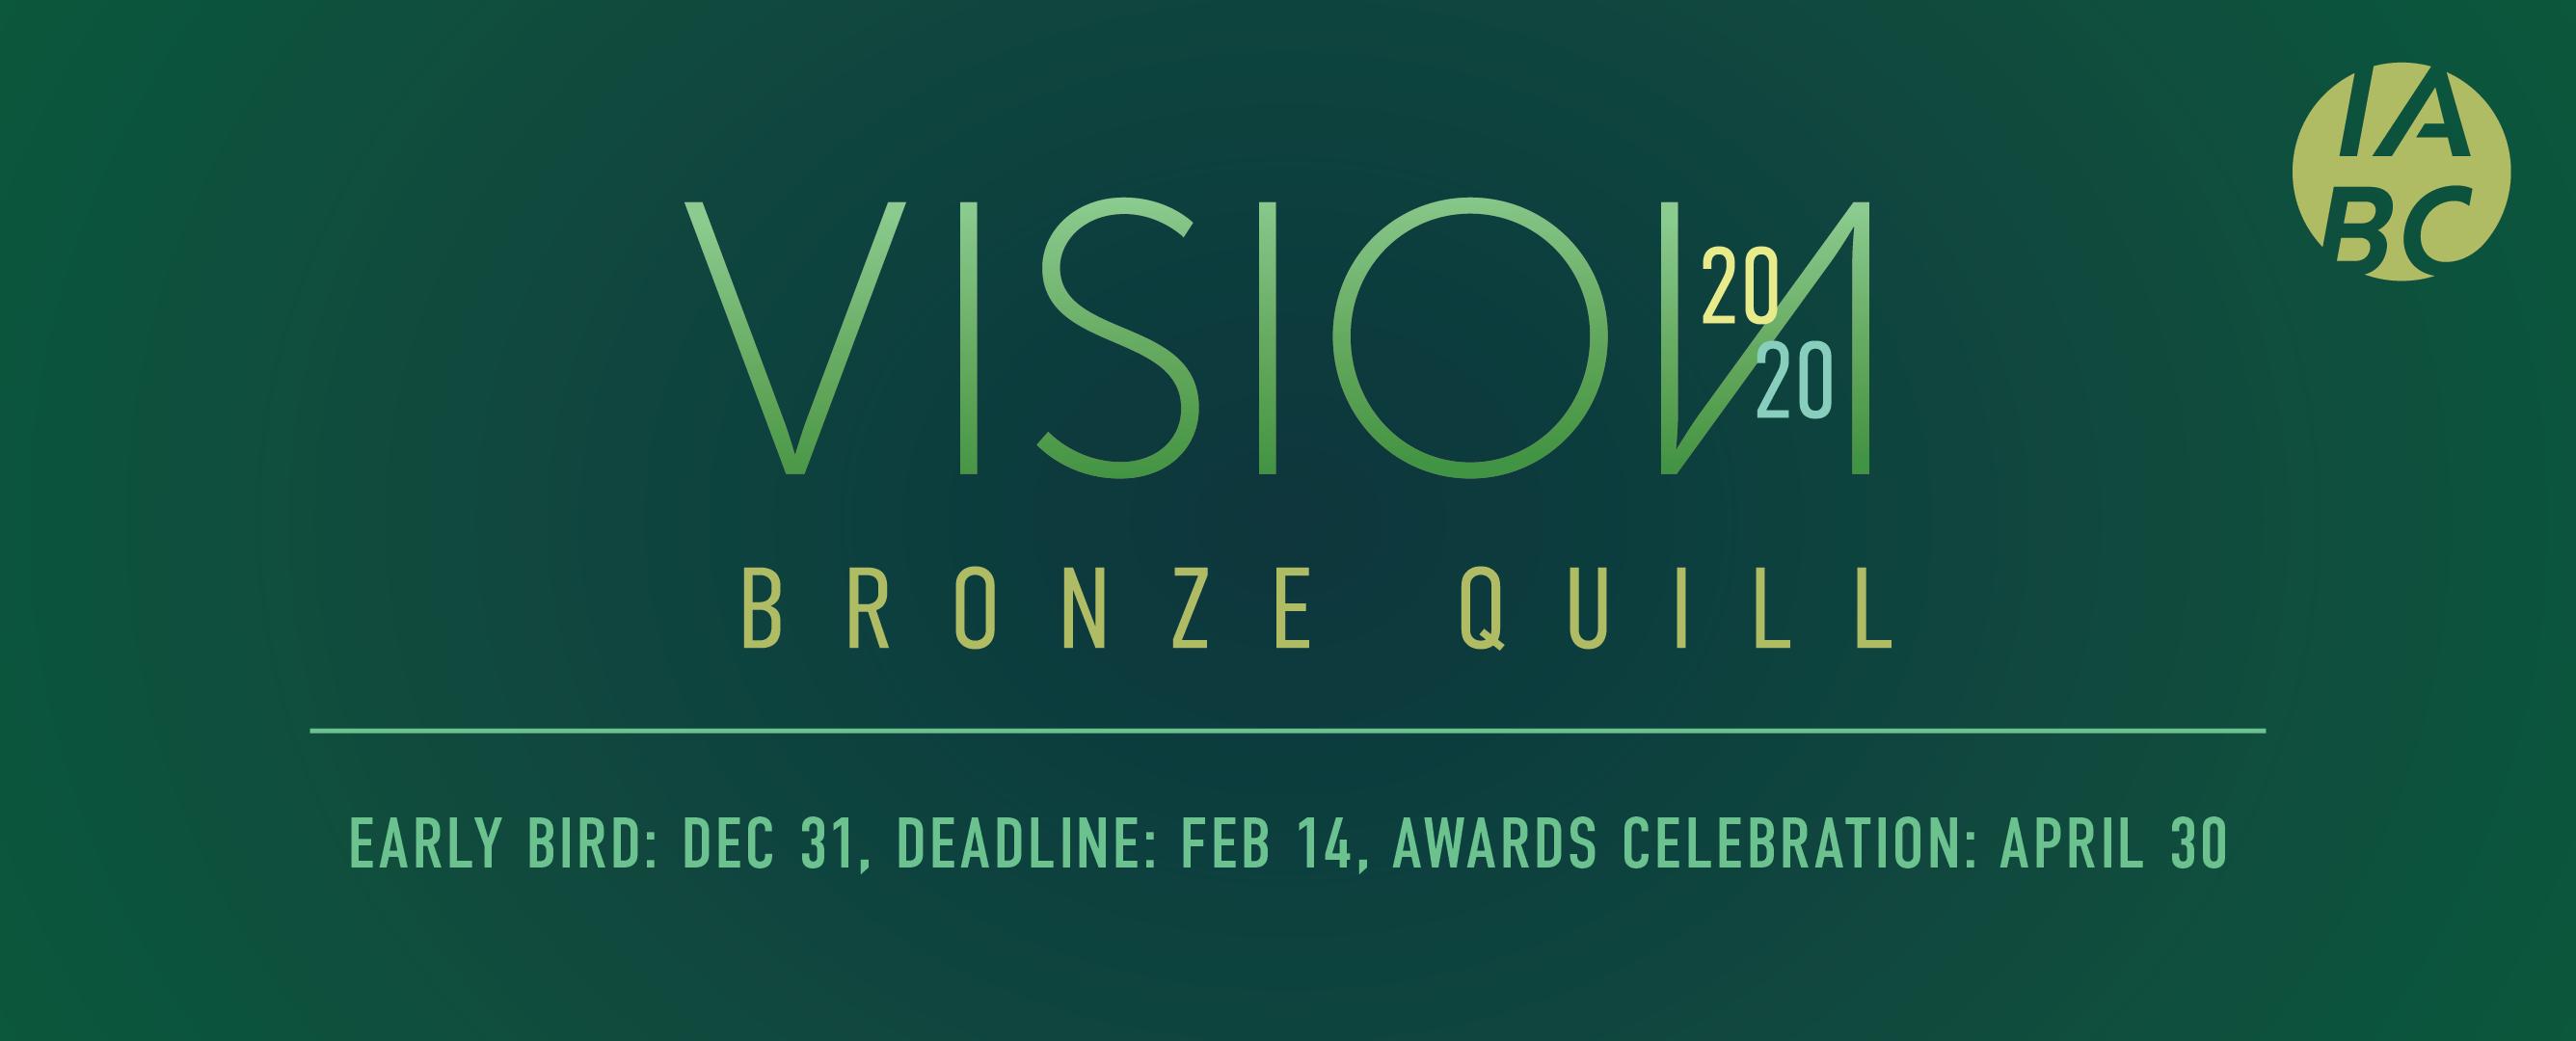 Vision 2020 Bronze Quill Early Bird: Dec 31, Deadline: Feb 14, awards celebration: April 30